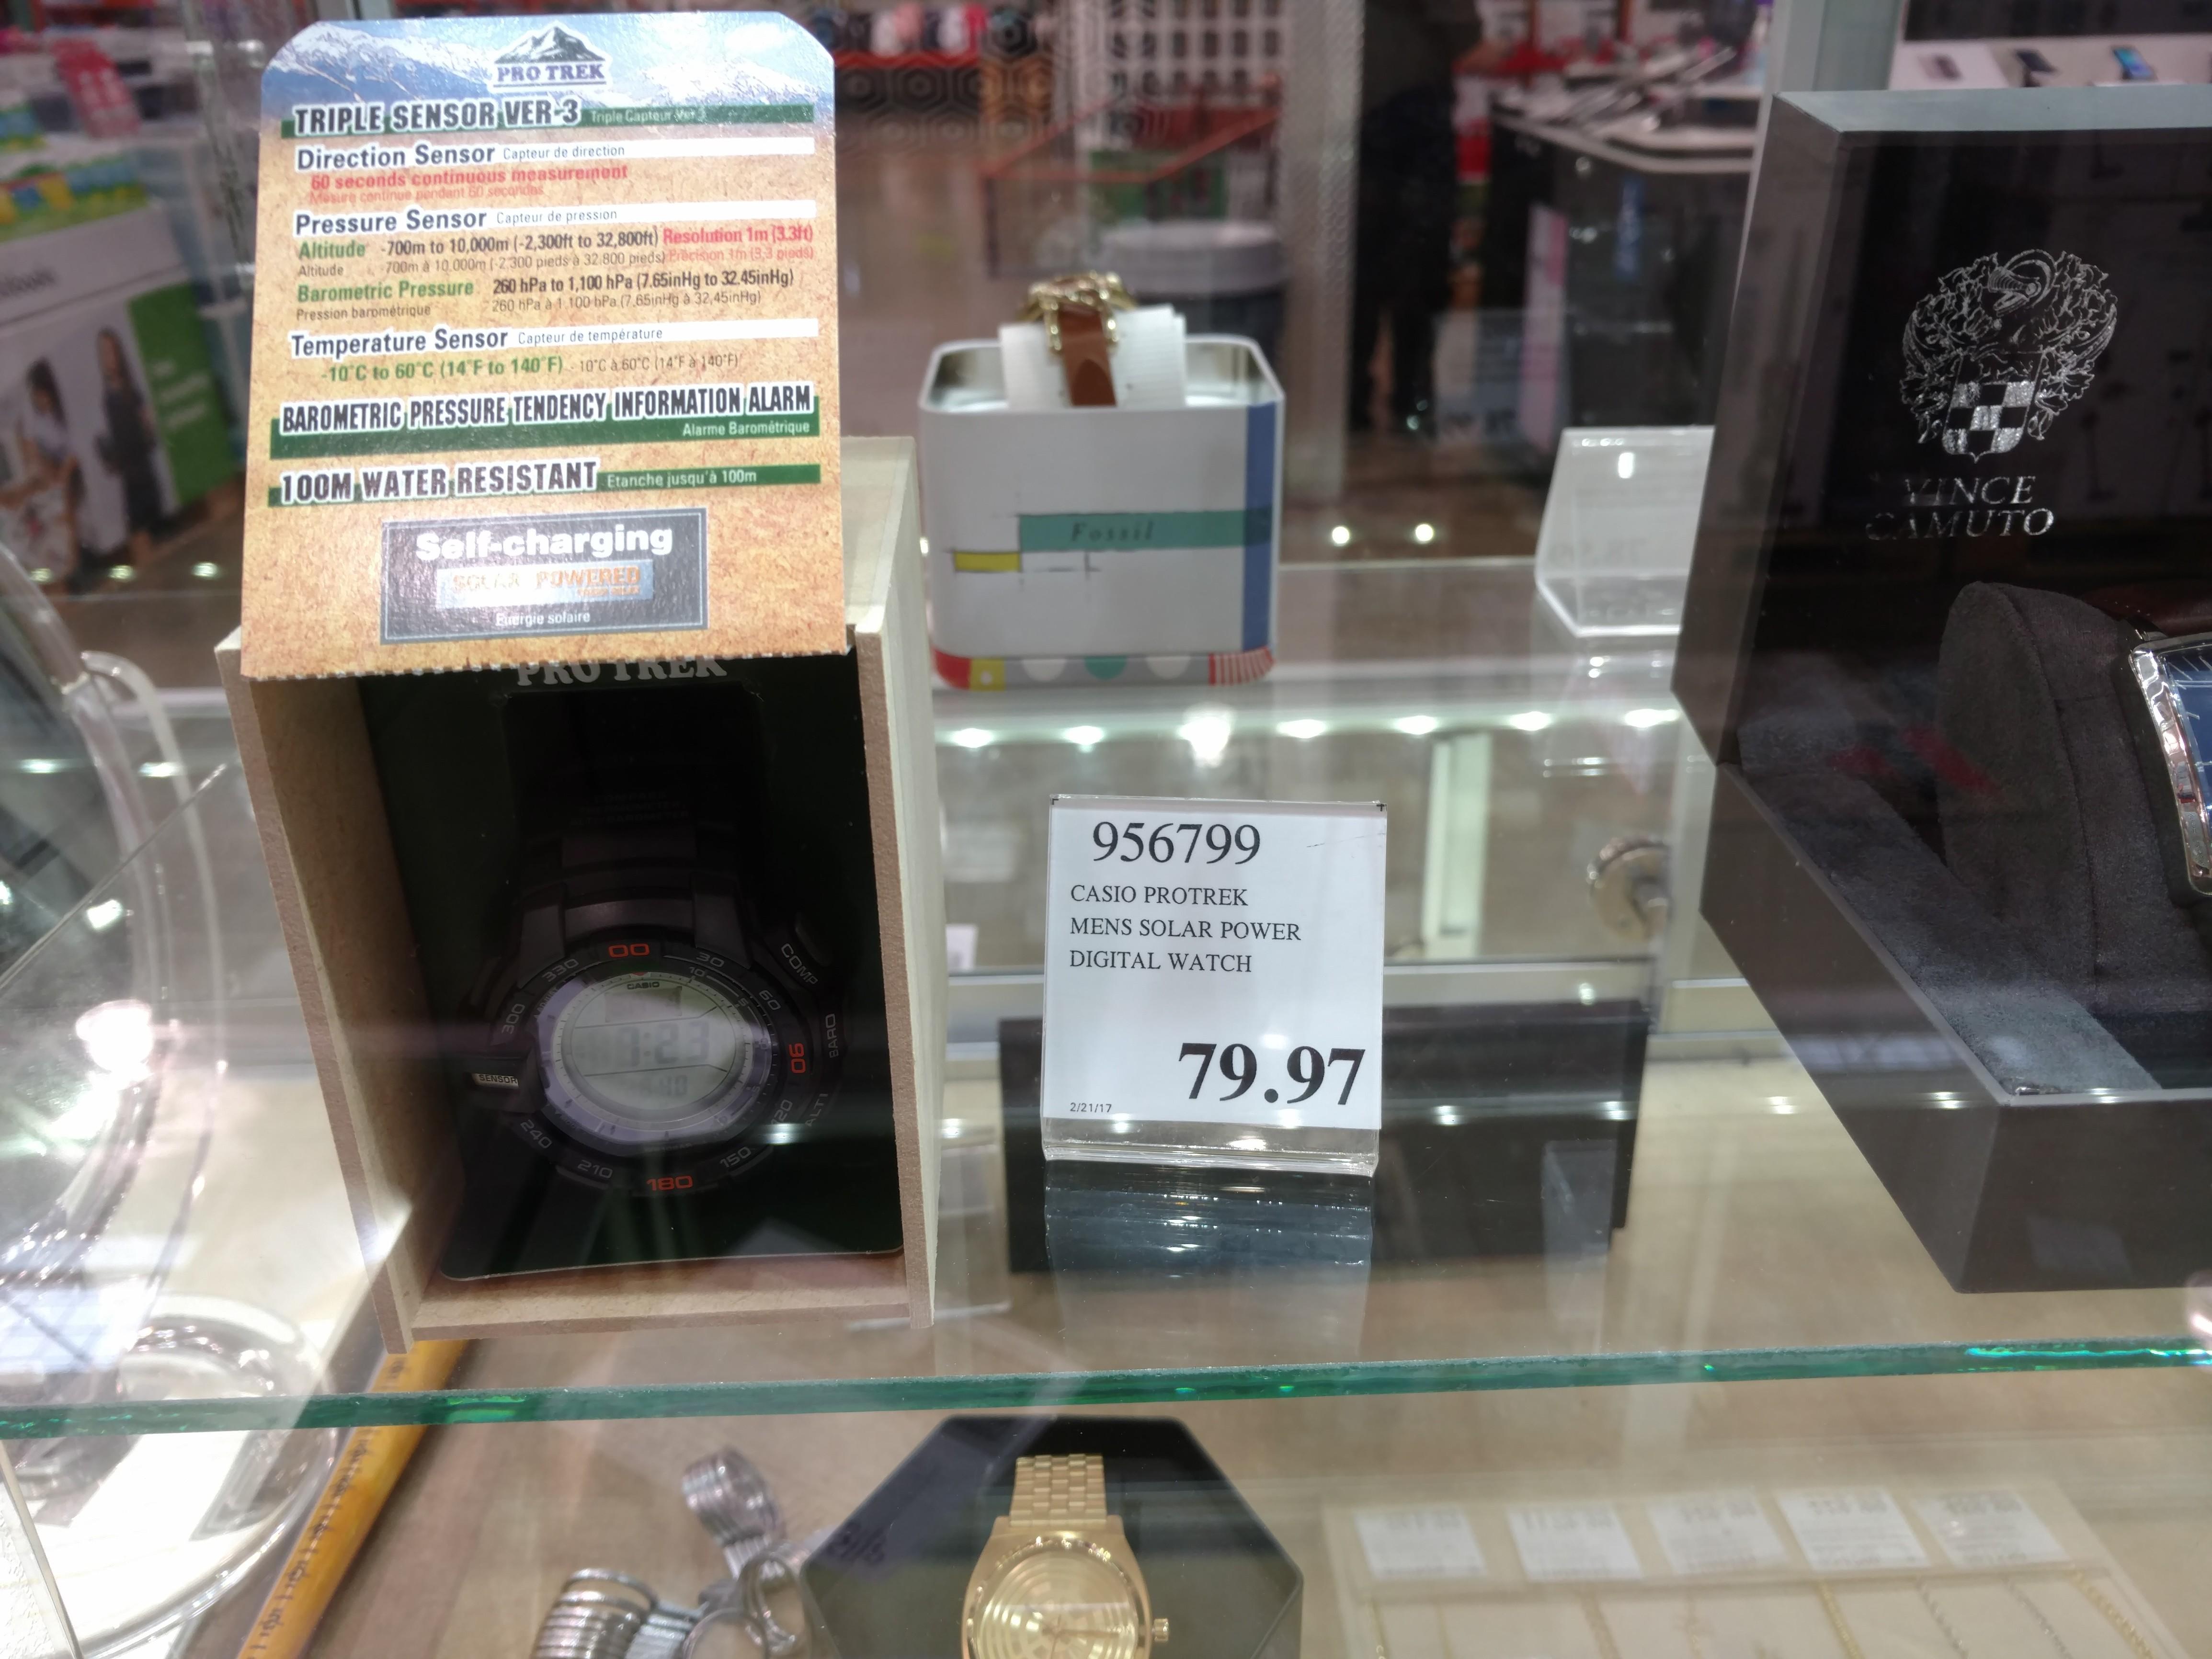 Casio Pro Trek PRG270 triple sensor solar watch $79.97 Costco online and B&M